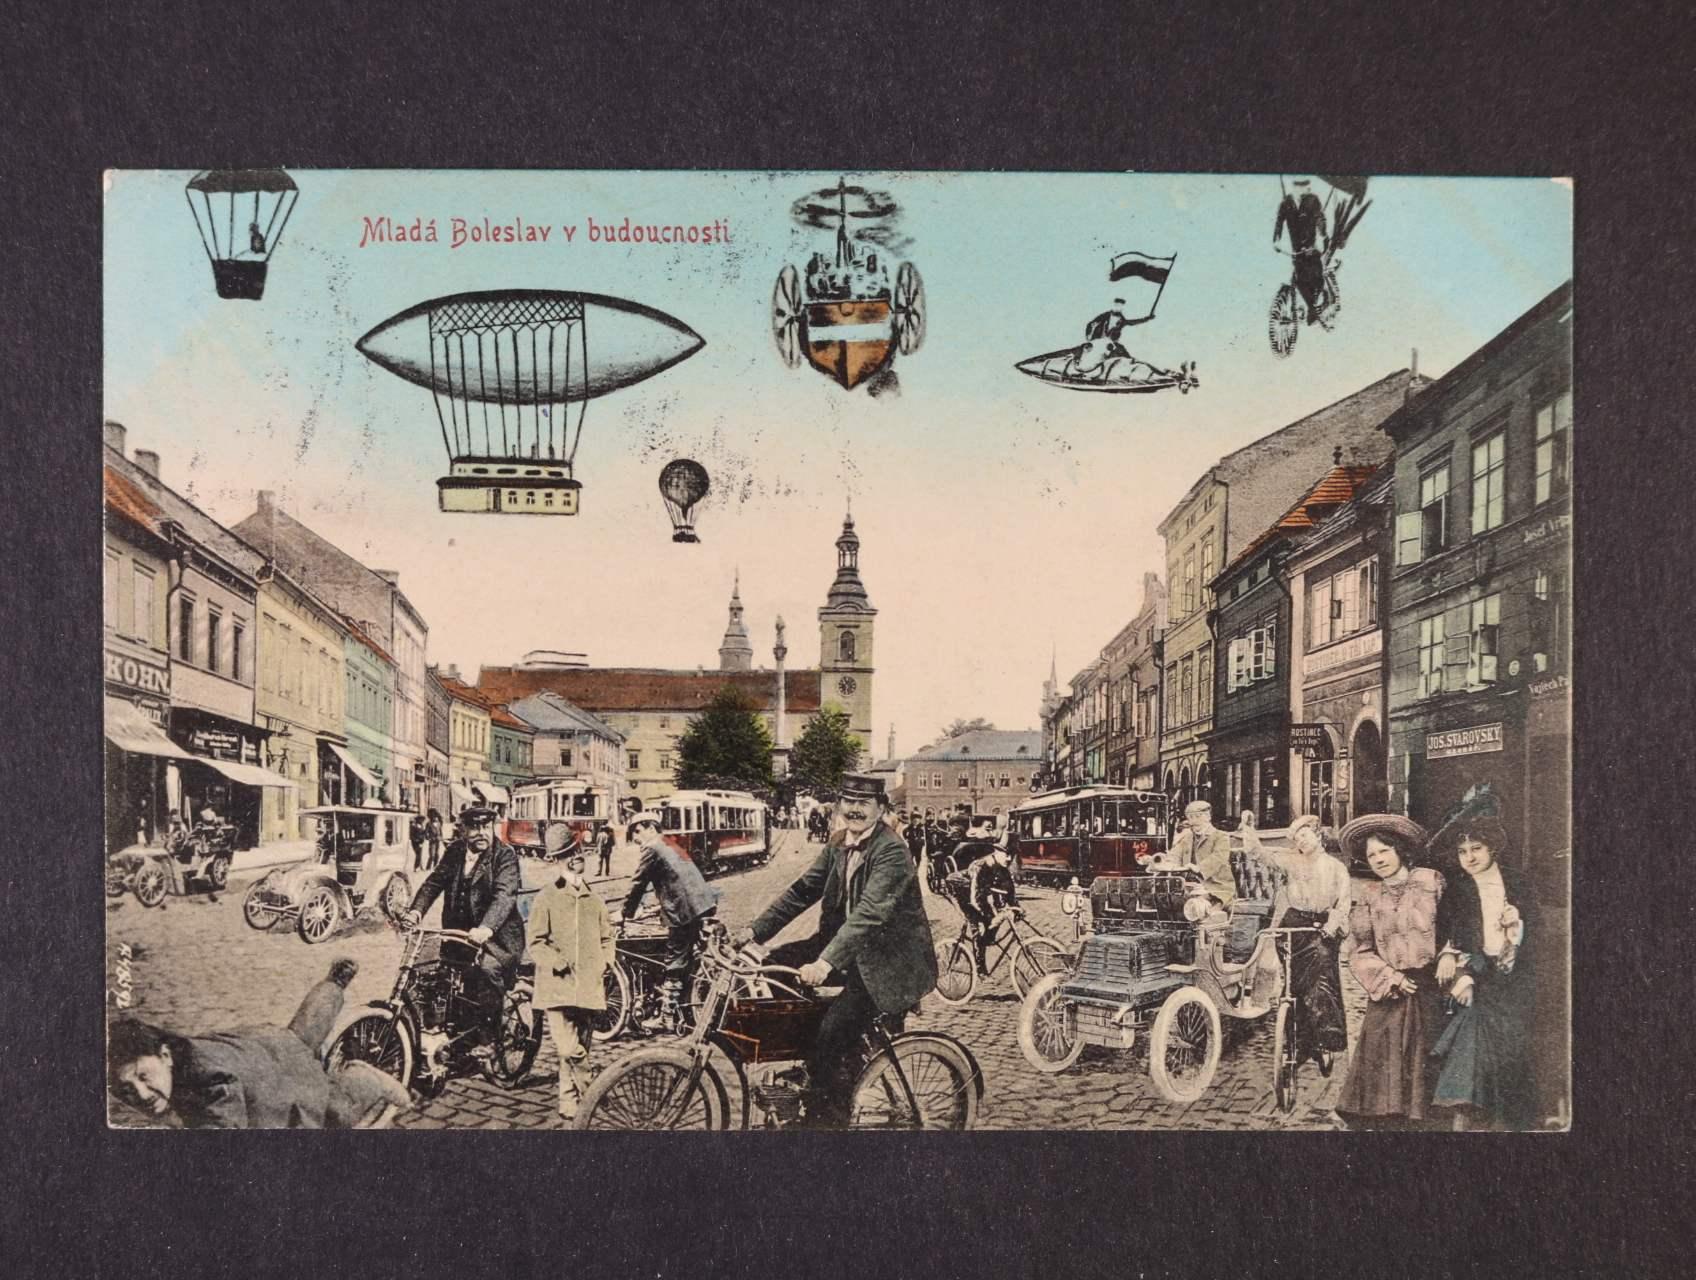 Mladá Boleslav - bar. koláž, použitá 1908, velmi dobrá kvalita